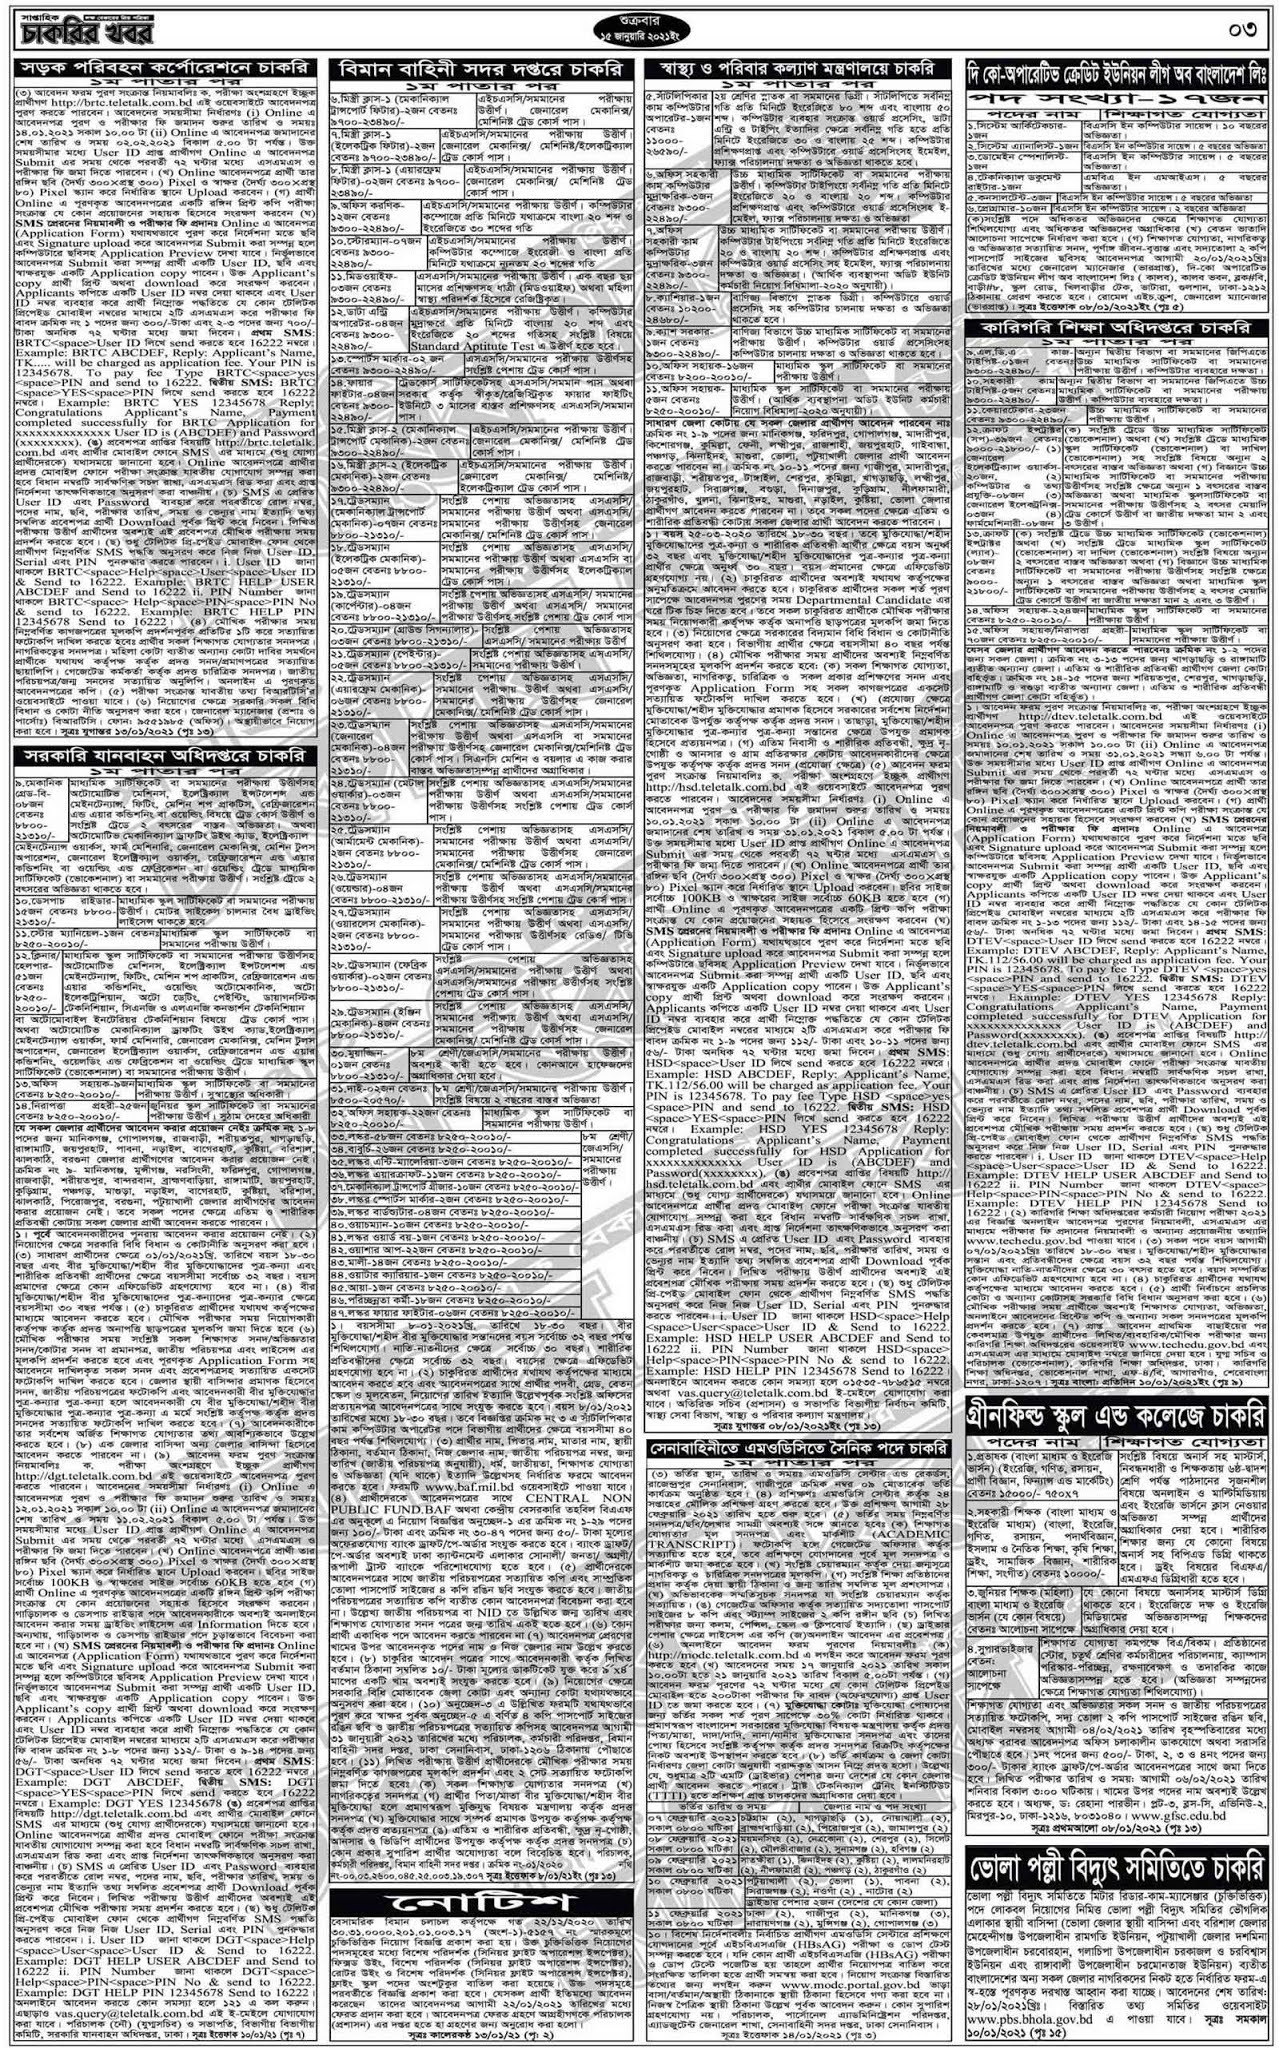 Saptahik Chakrir Khobor Potrika 15 January 2021 - সাপ্তাহিক চাকরির খবর পত্রিকা ১৫ জানুয়ারি ২০২১